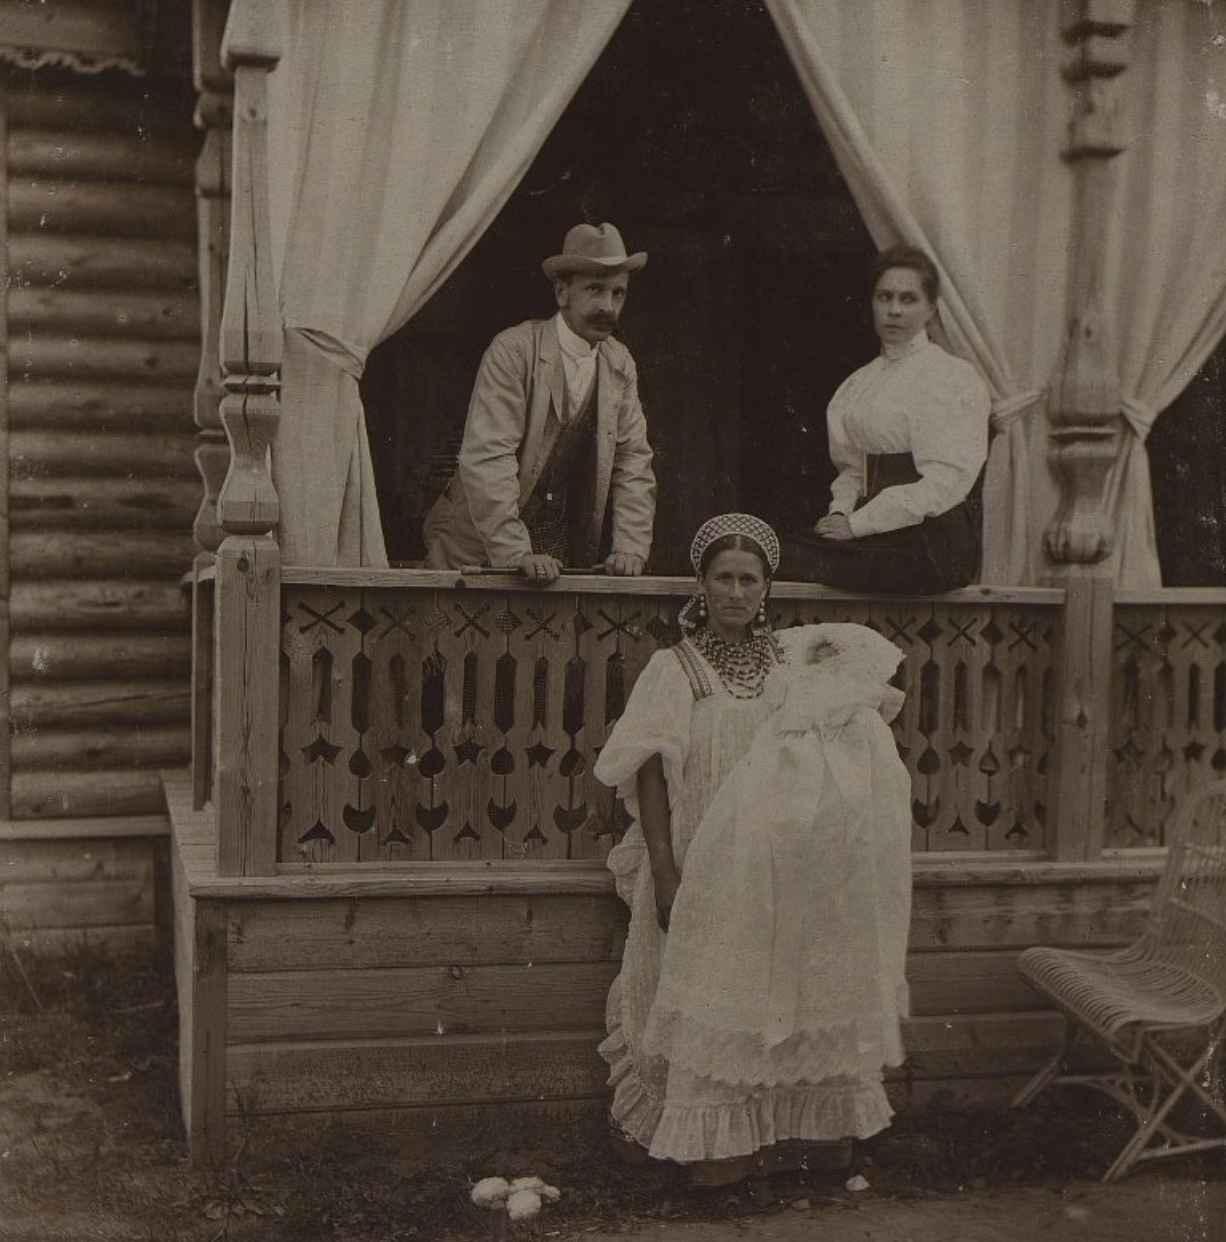 Неизвестные на крыльце здания. 1896 г.